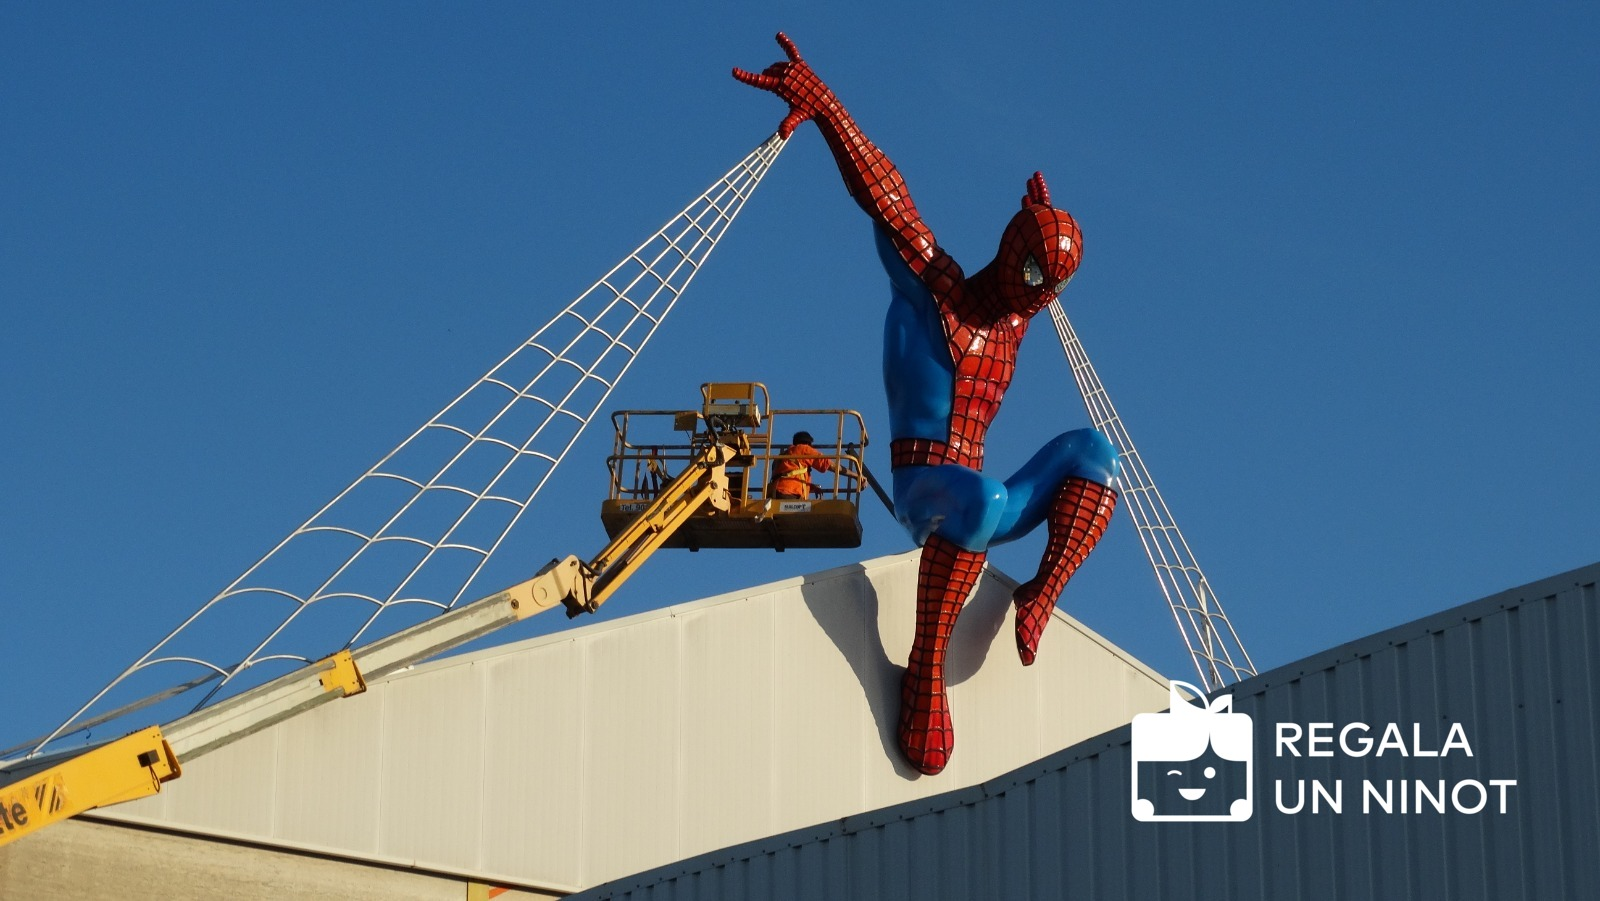 spiderman-pere-baenas-taller-fallero-regala-un-ninot-1